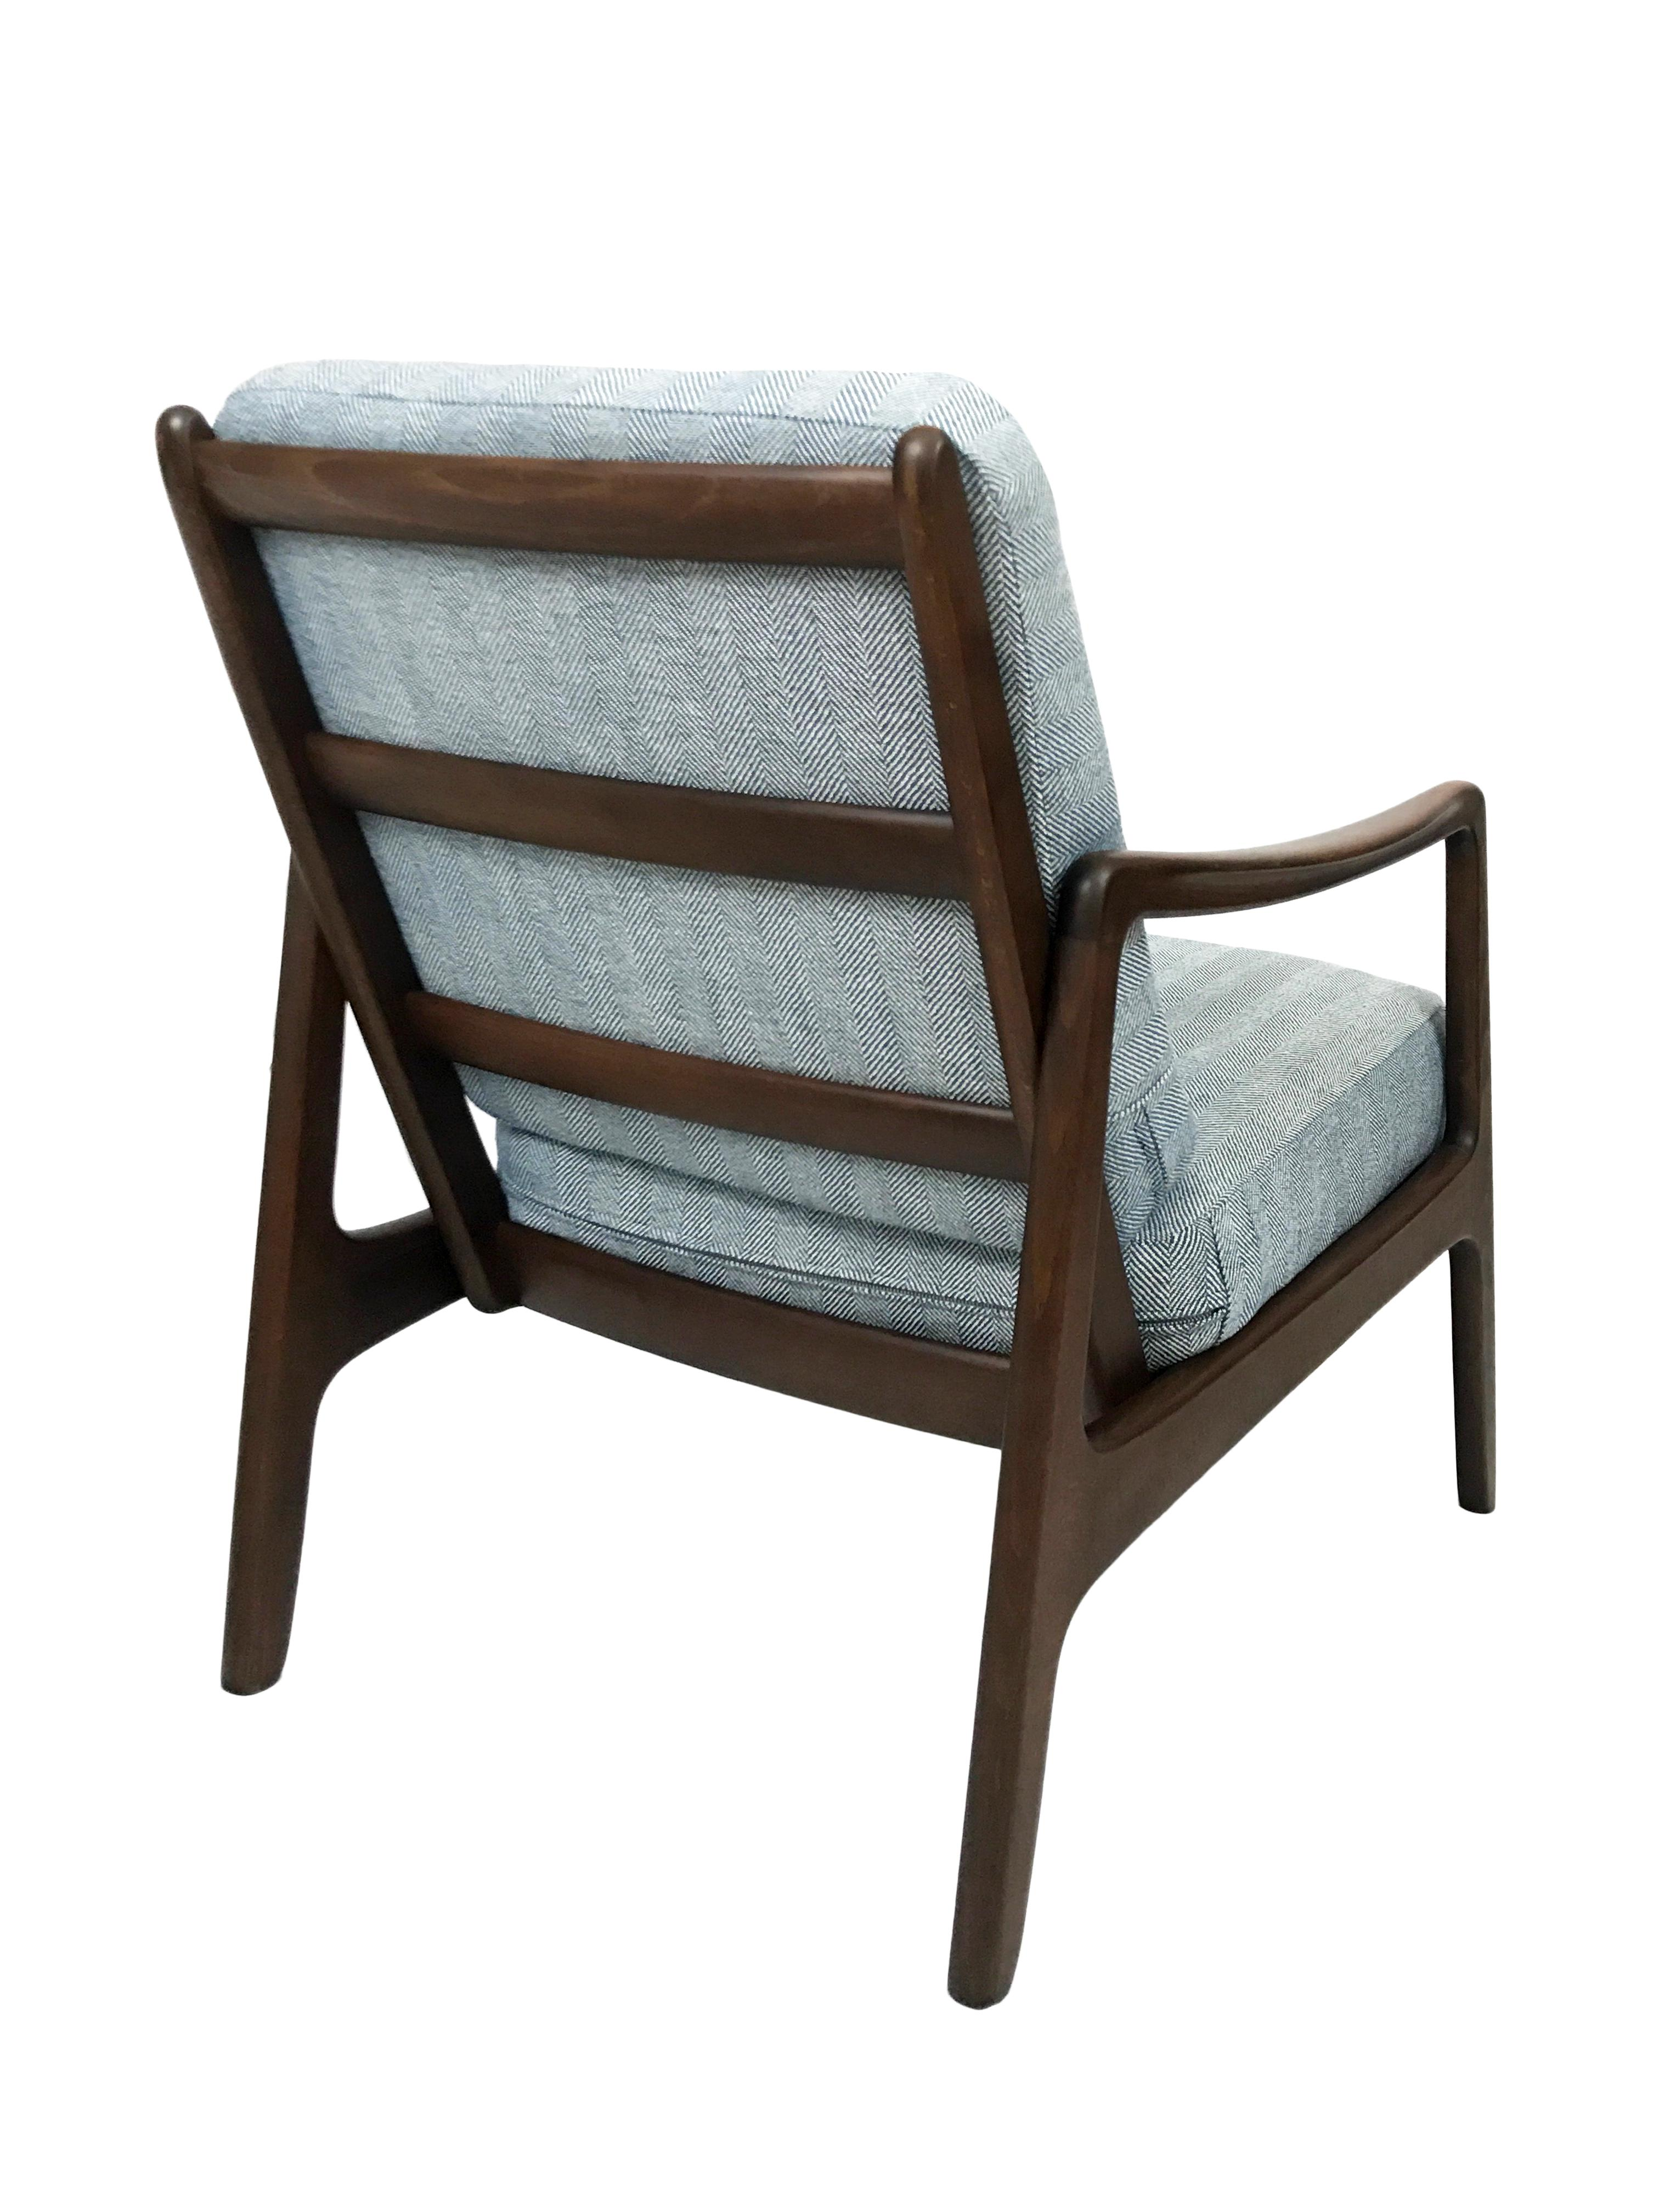 Perfect France U0026 Daverkosen Mid Century Herringbone Lounge Chair By Ole Wanscher  Model 109   Image 4